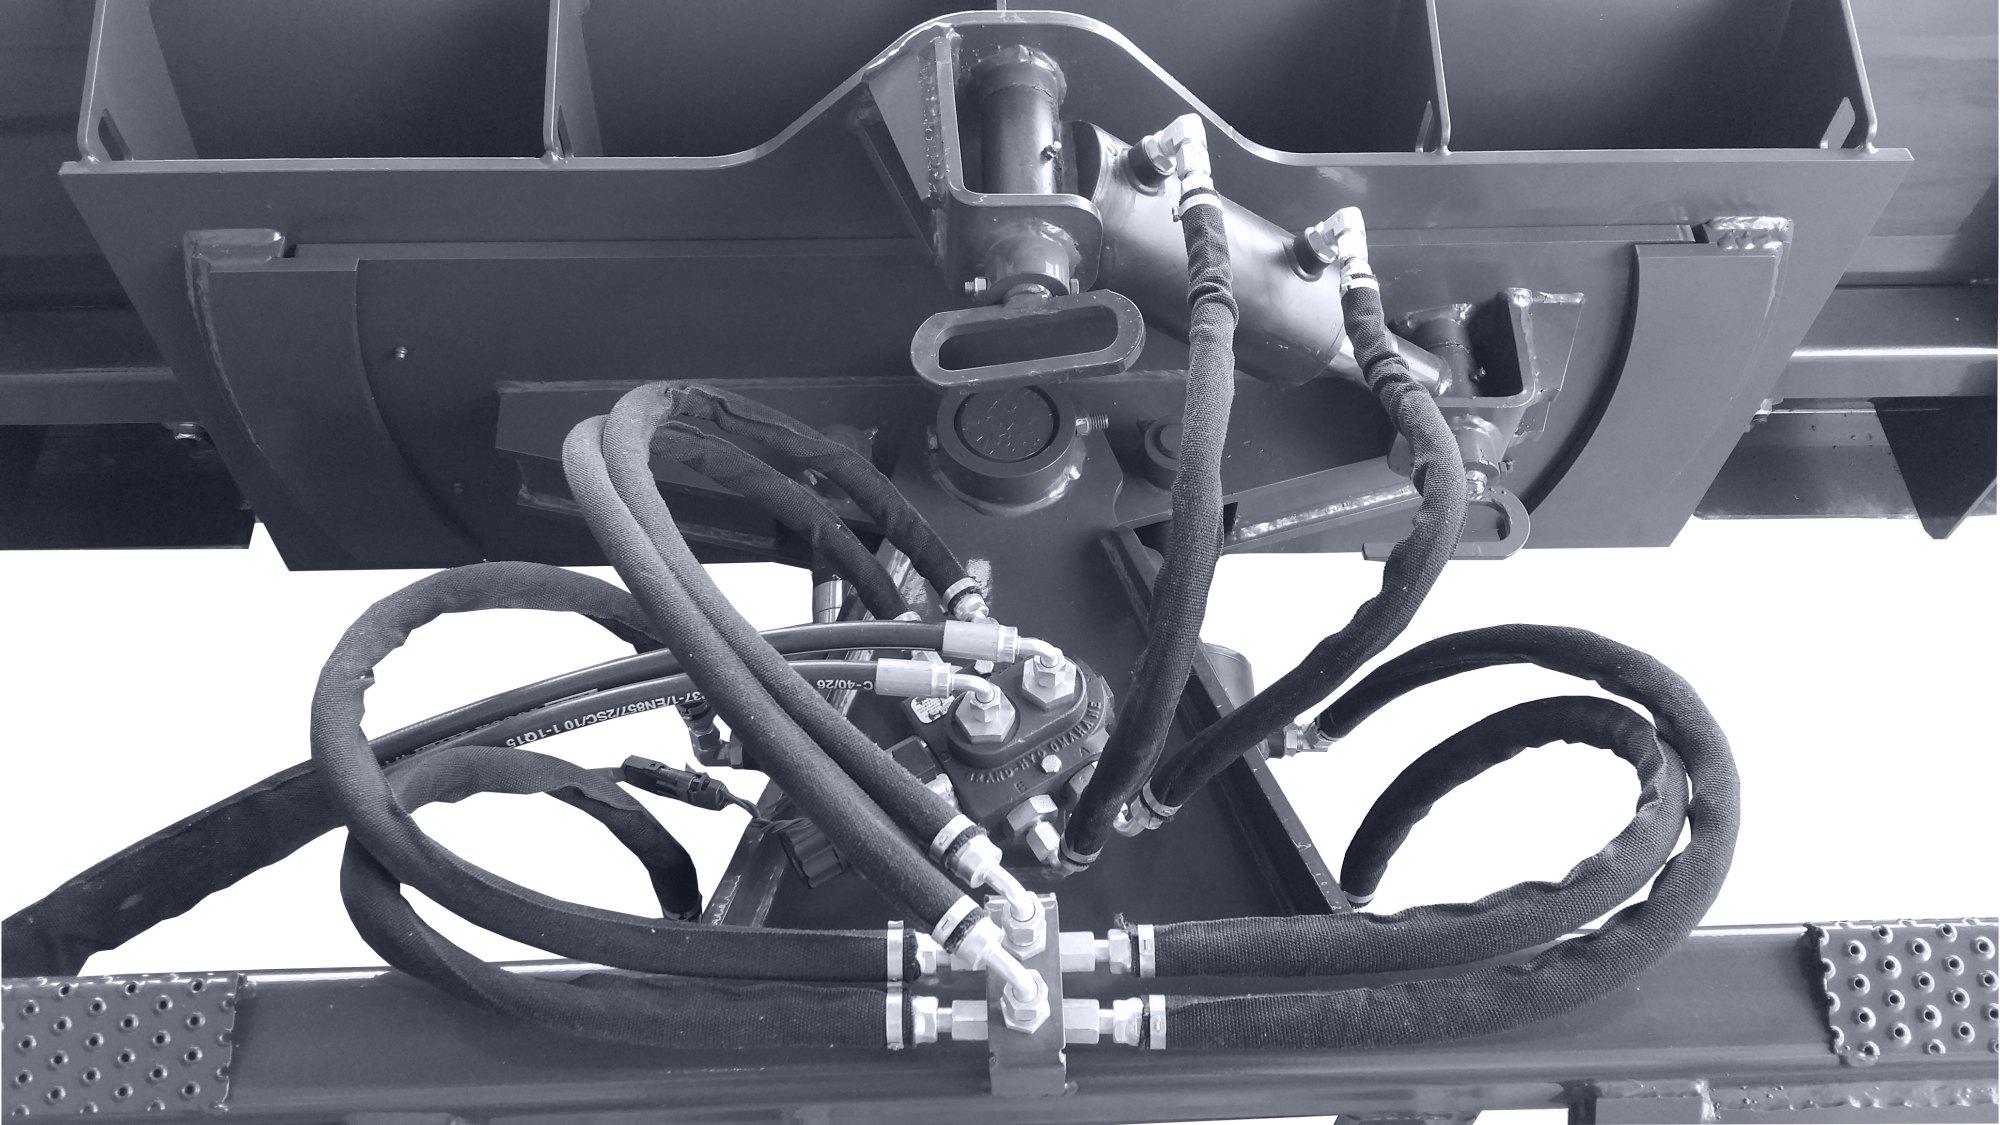 hight resolution of 6 way dozer blade back view